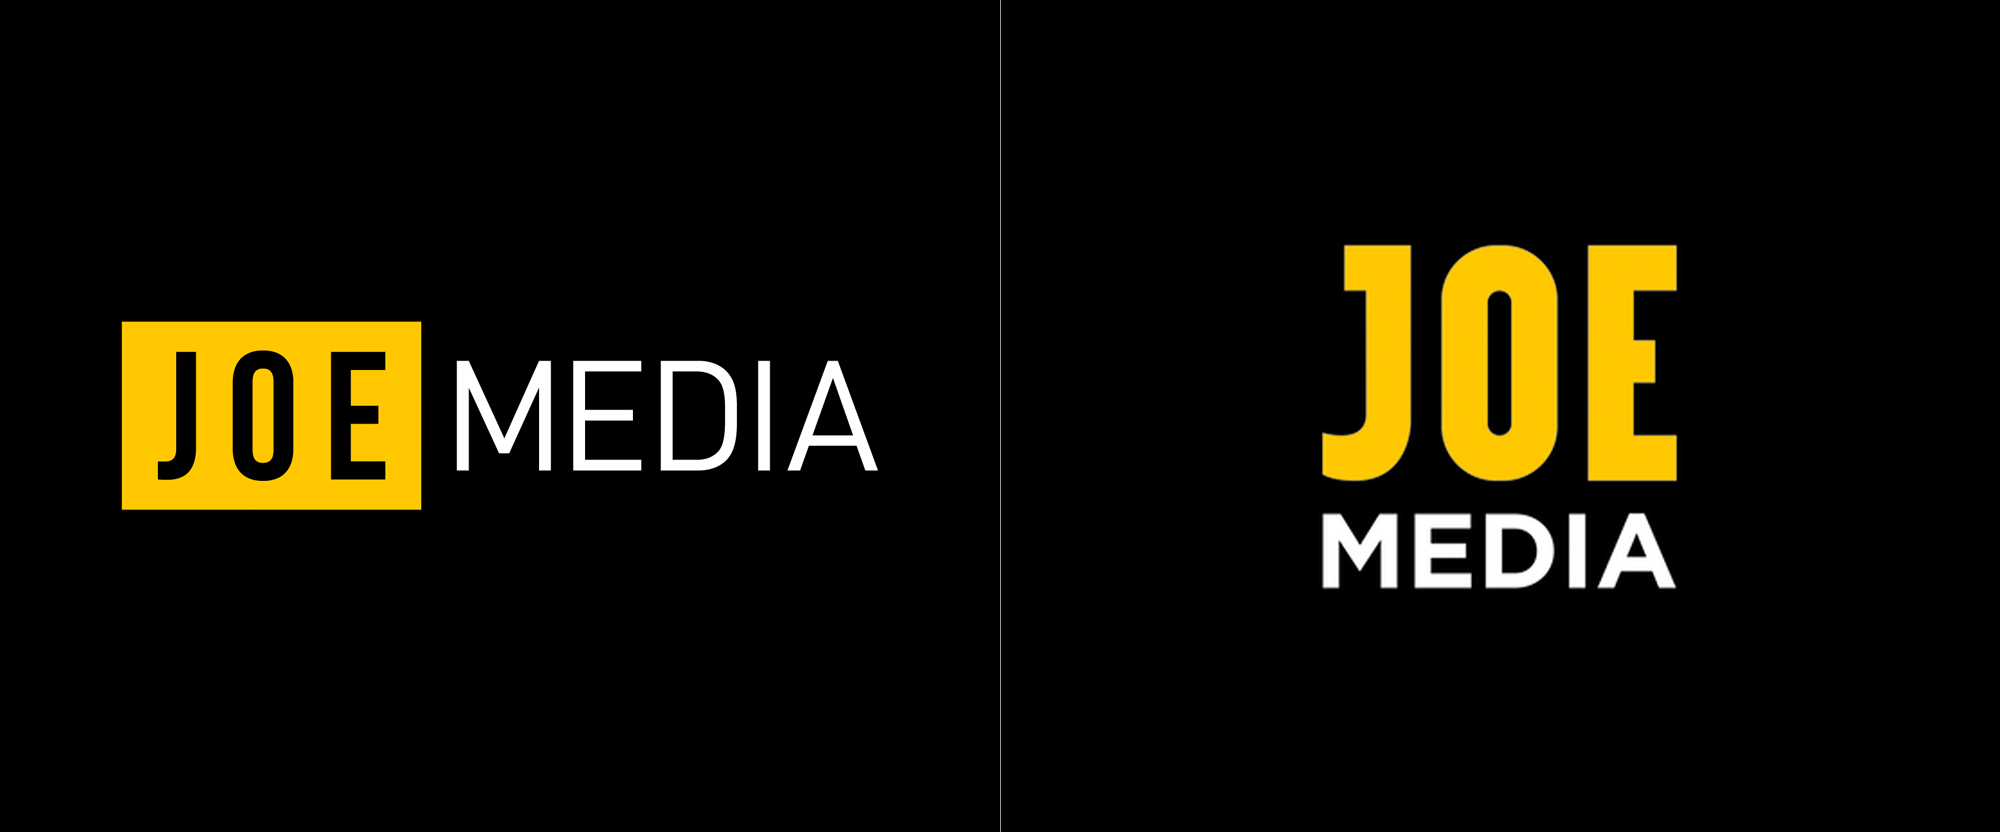 New Logo for Joe Media done In-house